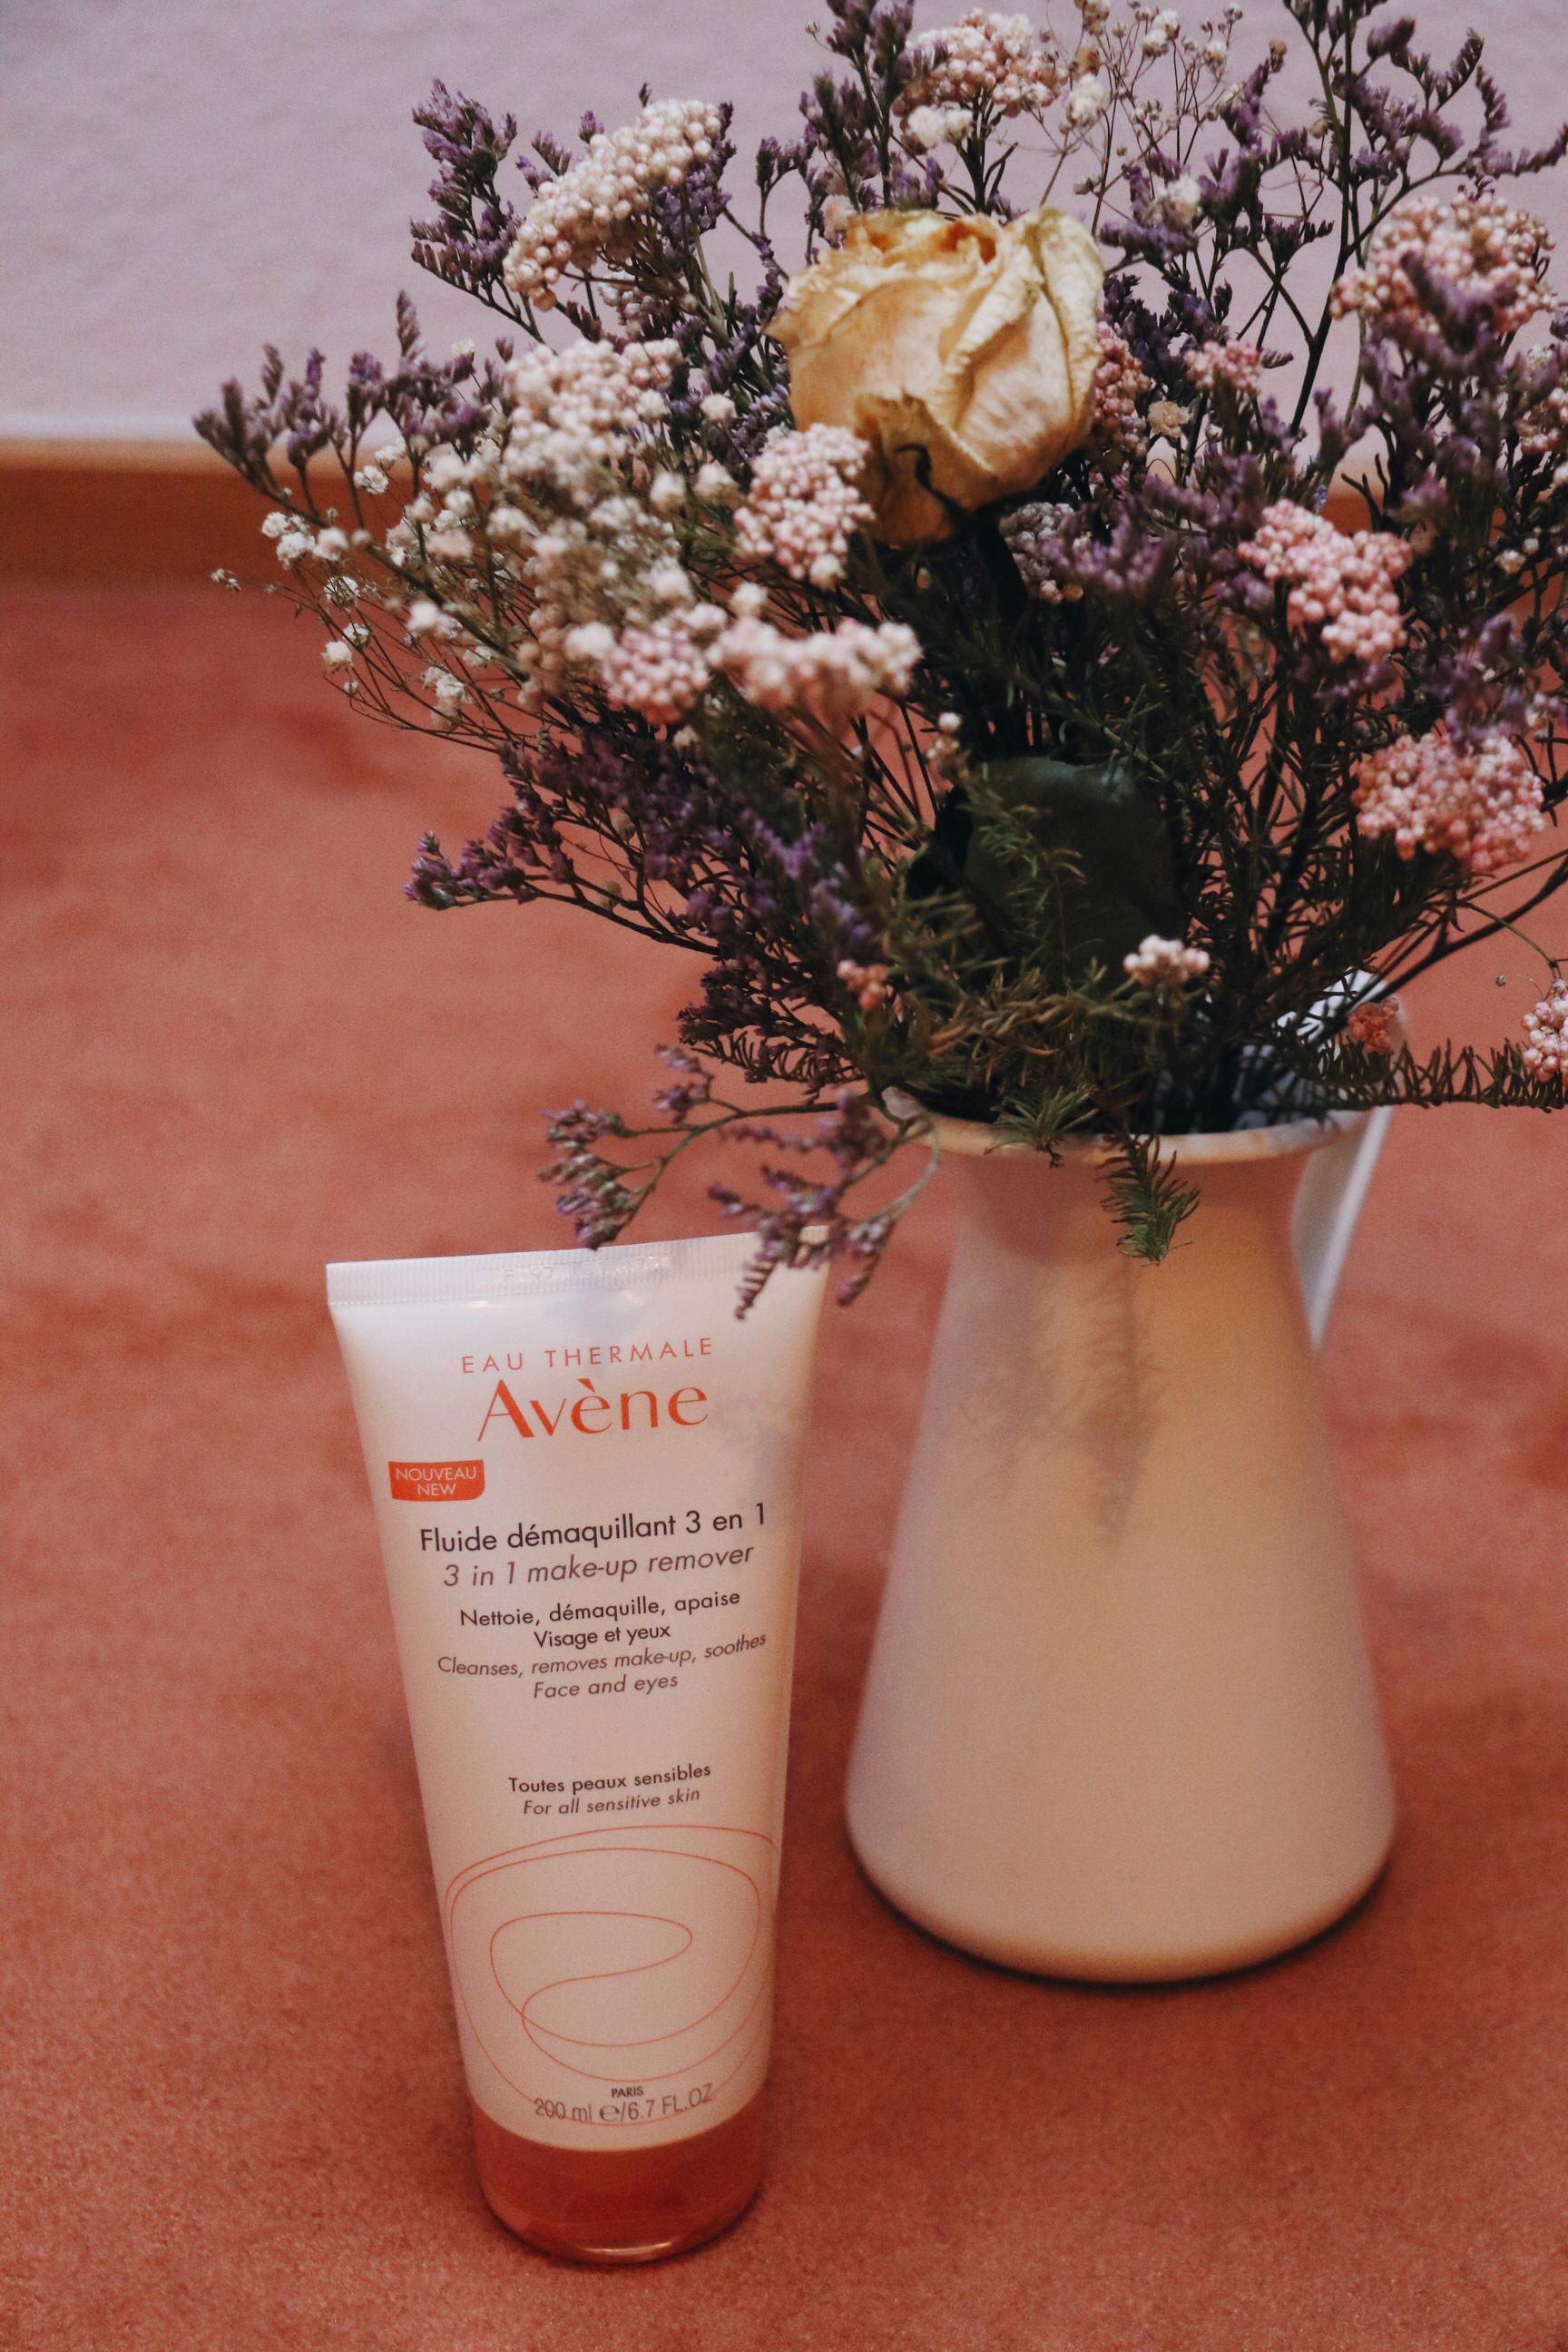 Avene 3 in 1 Reinigungsfluid Pfelge Tipps Blog Beauty